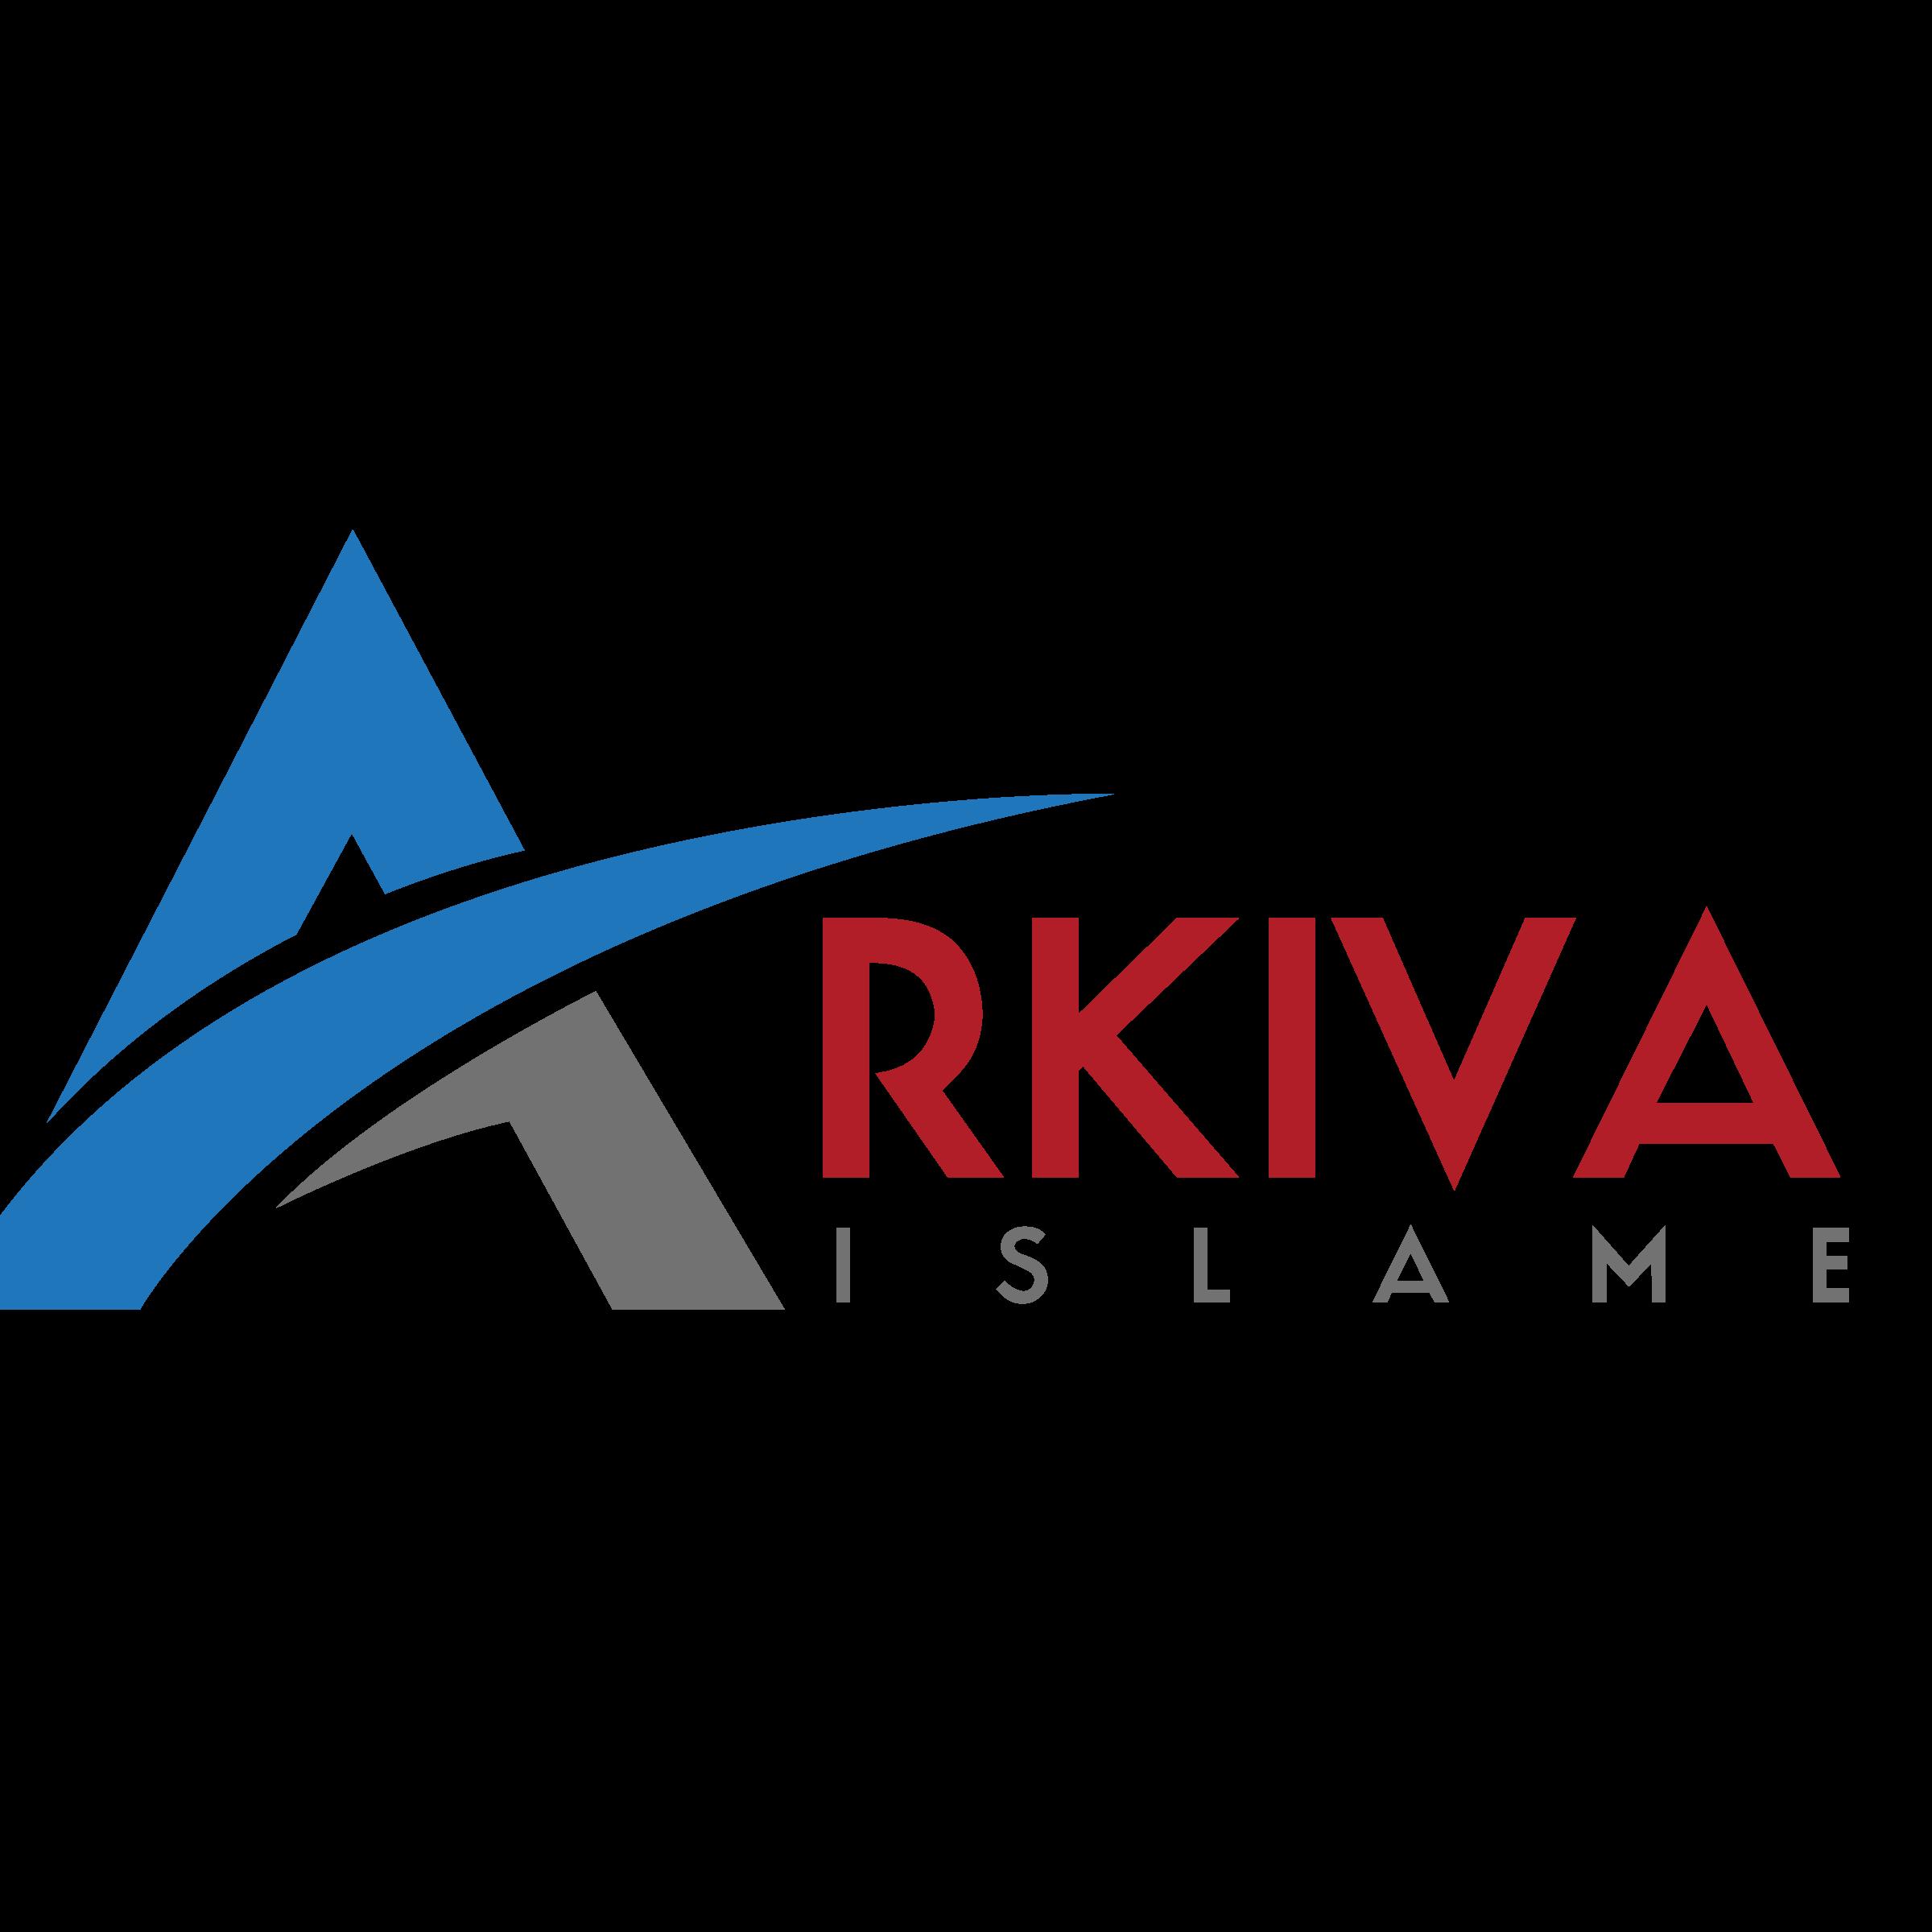 Arkiva Islame